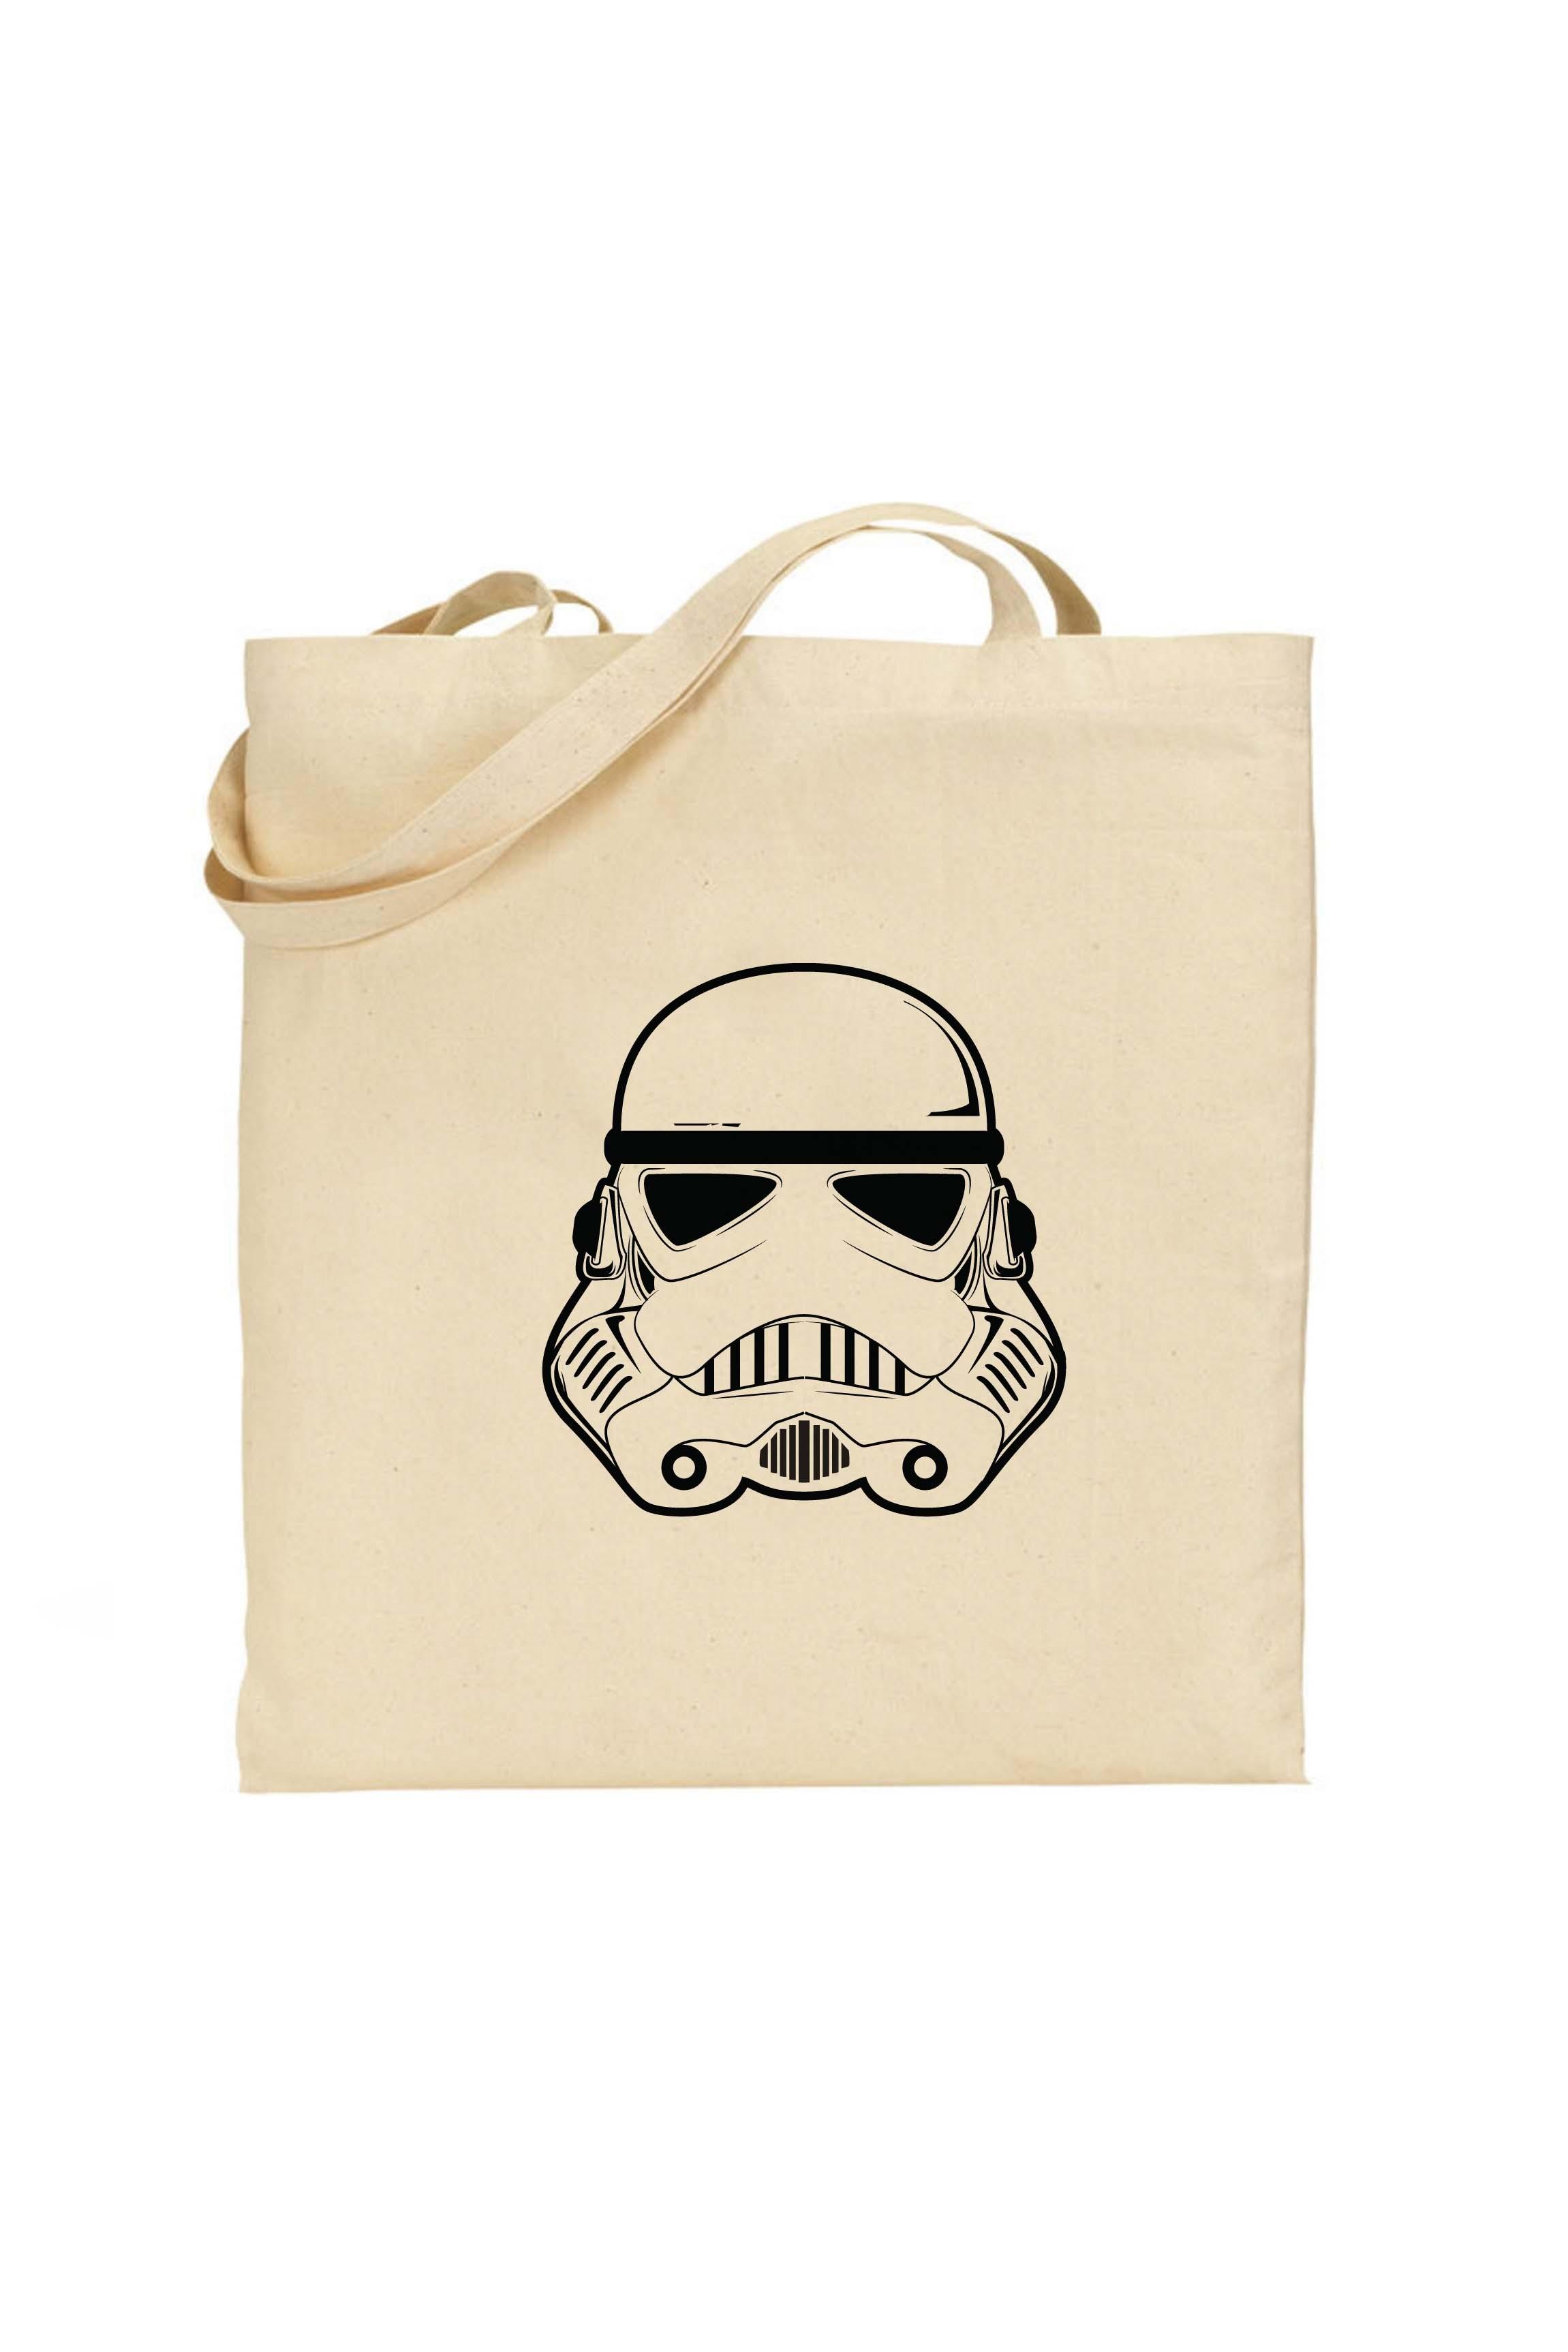 Tote Bag Star Wars